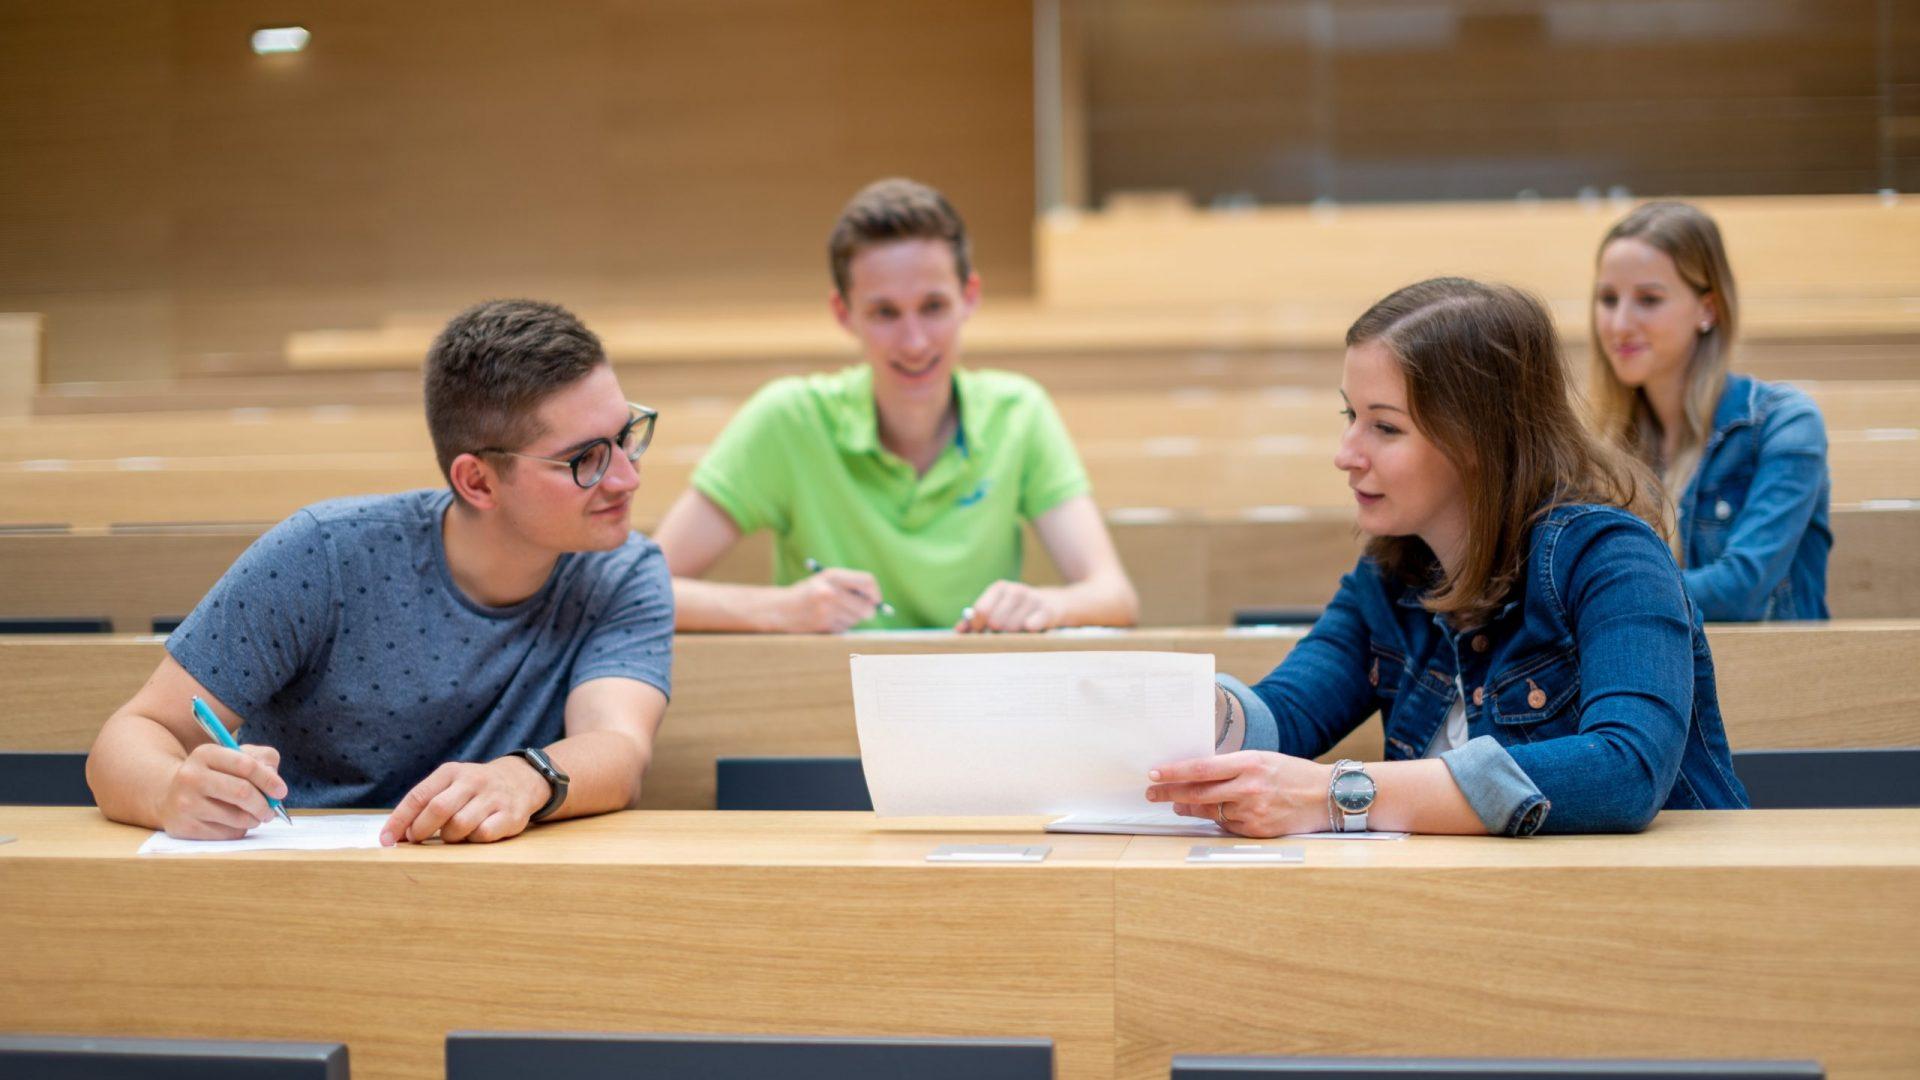 Claudia_Plakolm mit Studenten